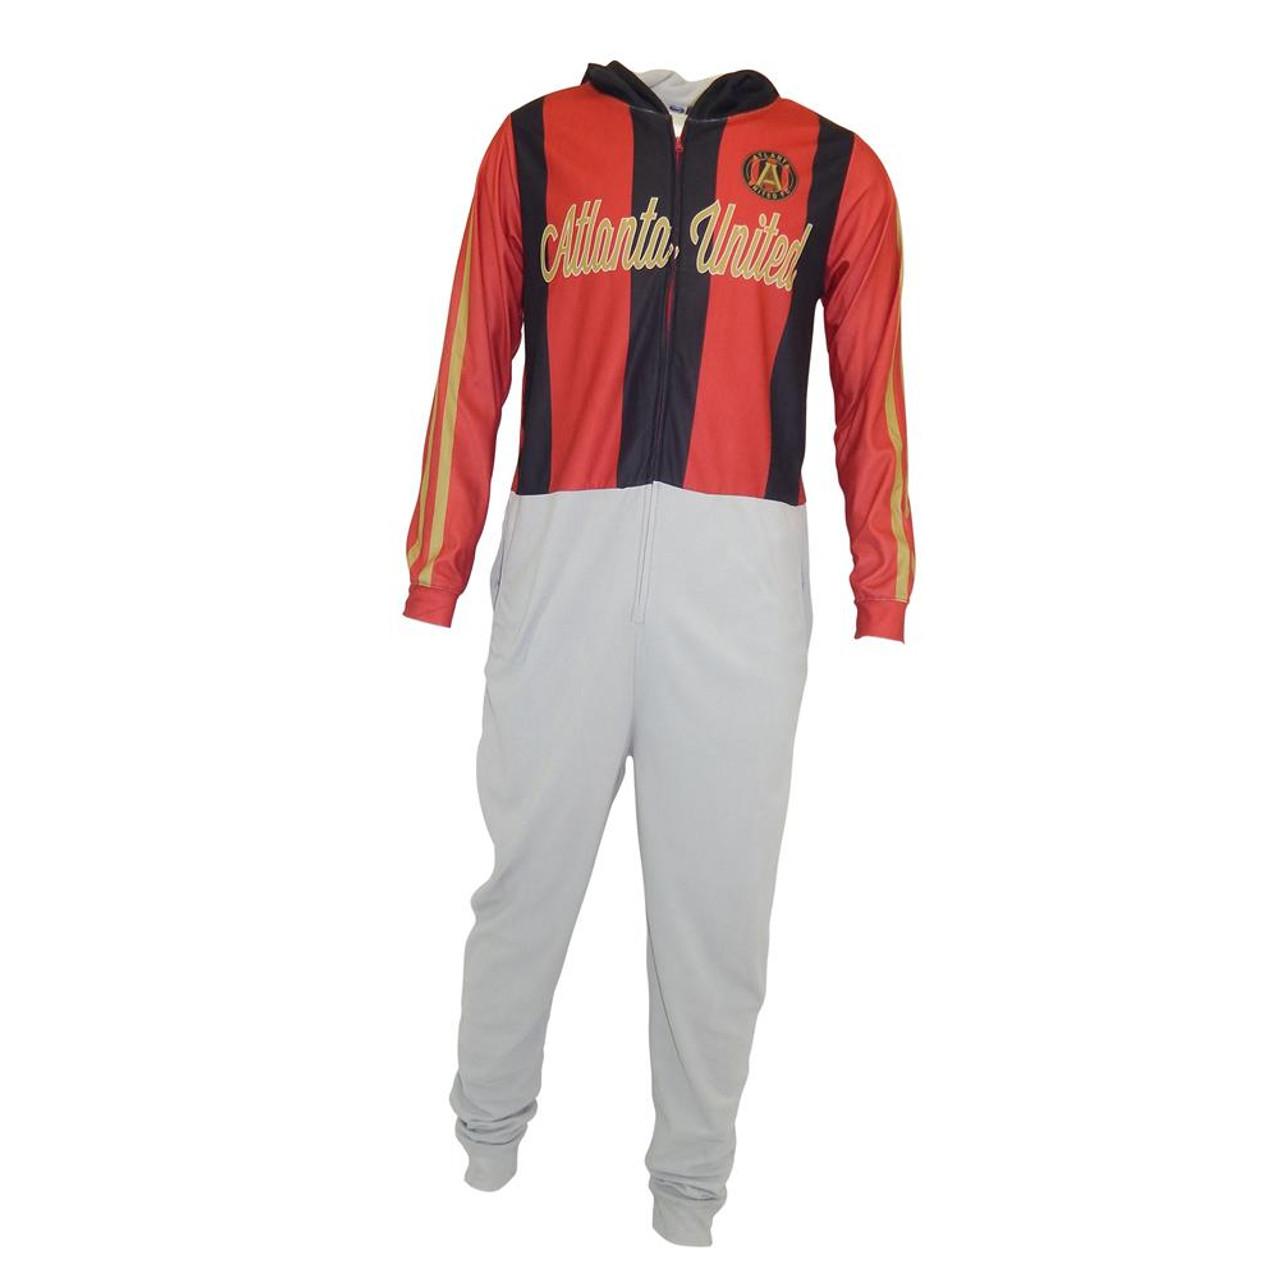 Atlanta United FC Union Suit Warm Up Uniform Pajamas